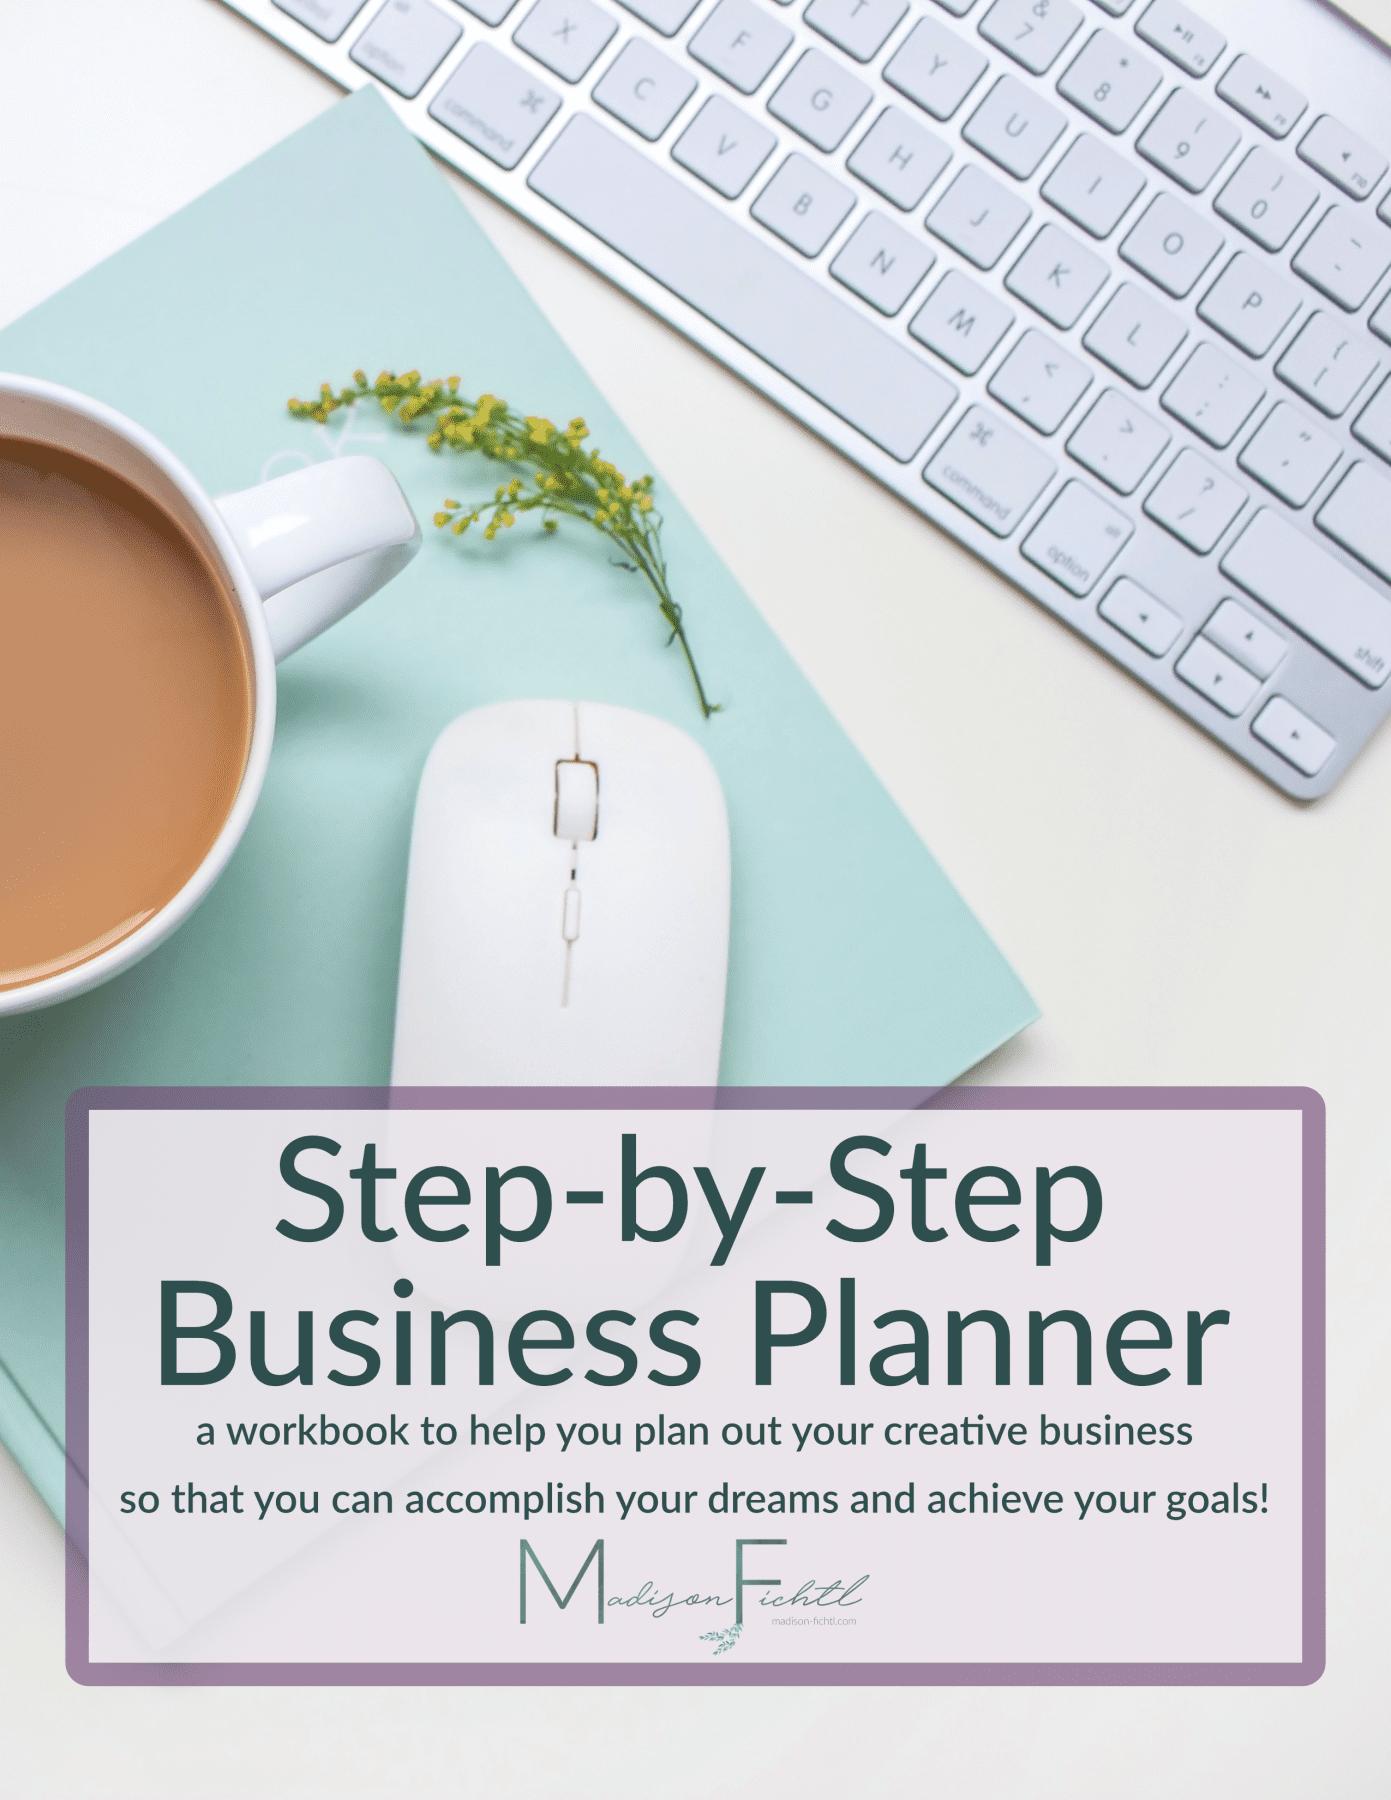 Business Planner   Madison Fichtl   Madison-fichtl.com